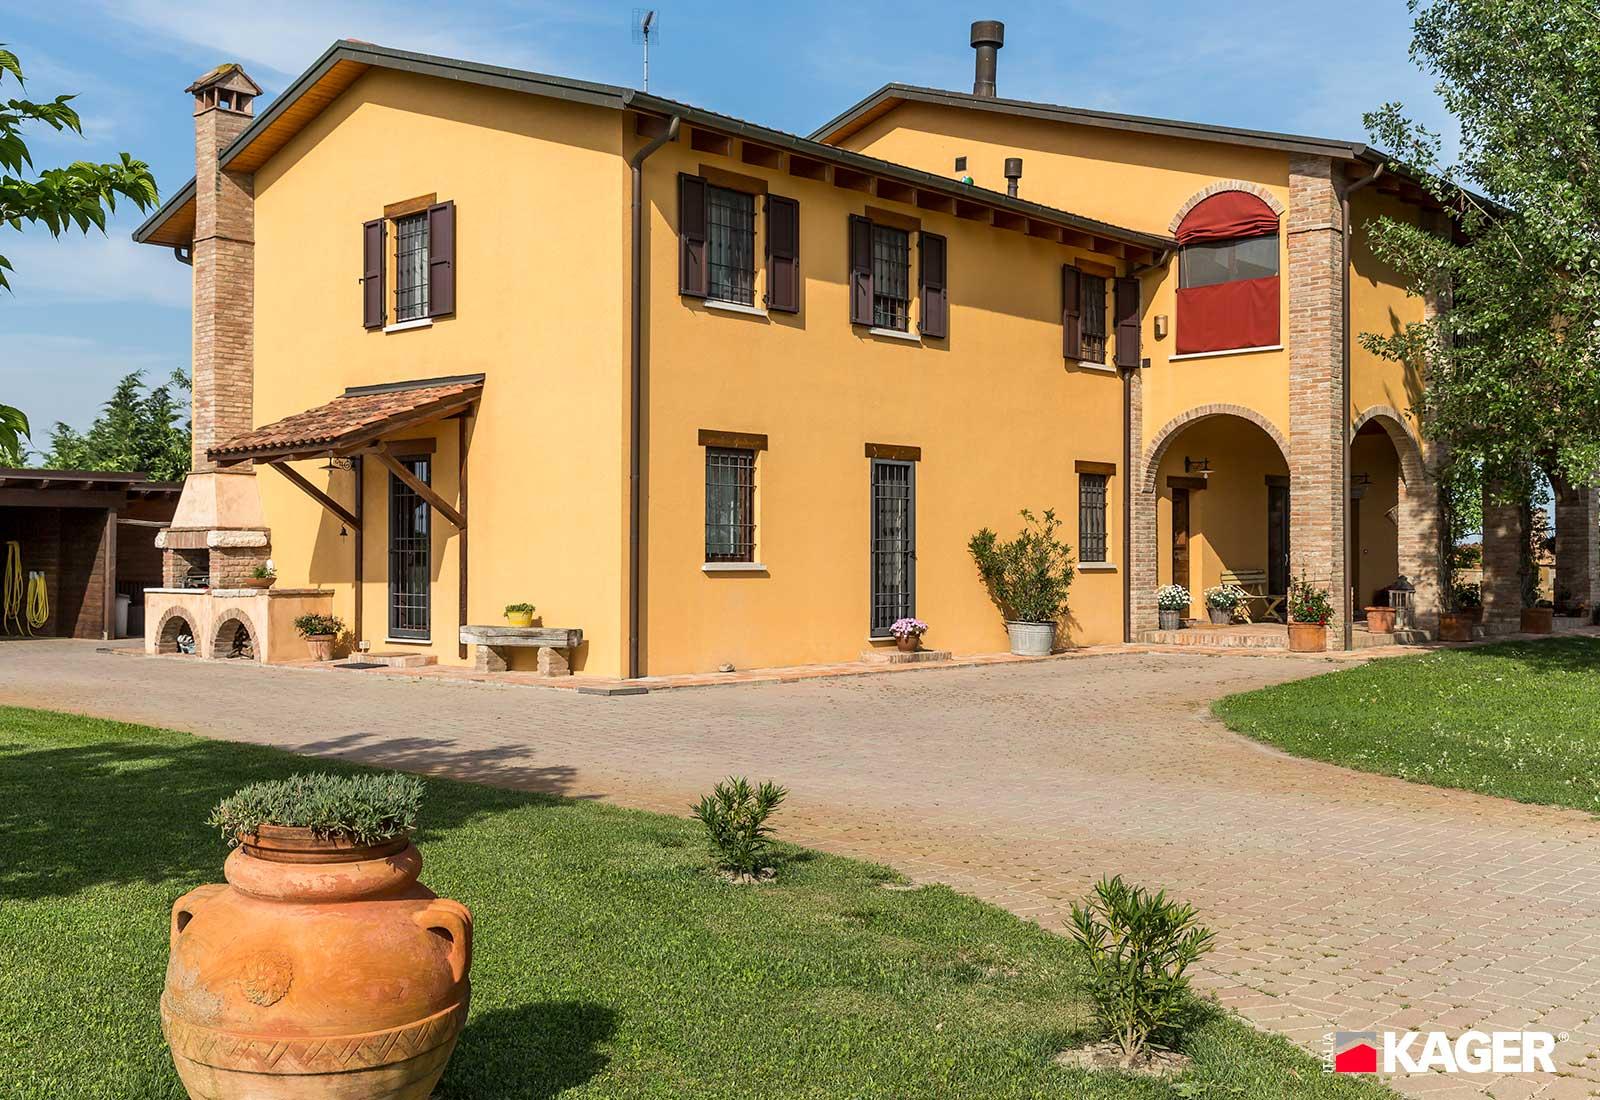 Casa-in-legno-Ferrara-Kager-Italia-03